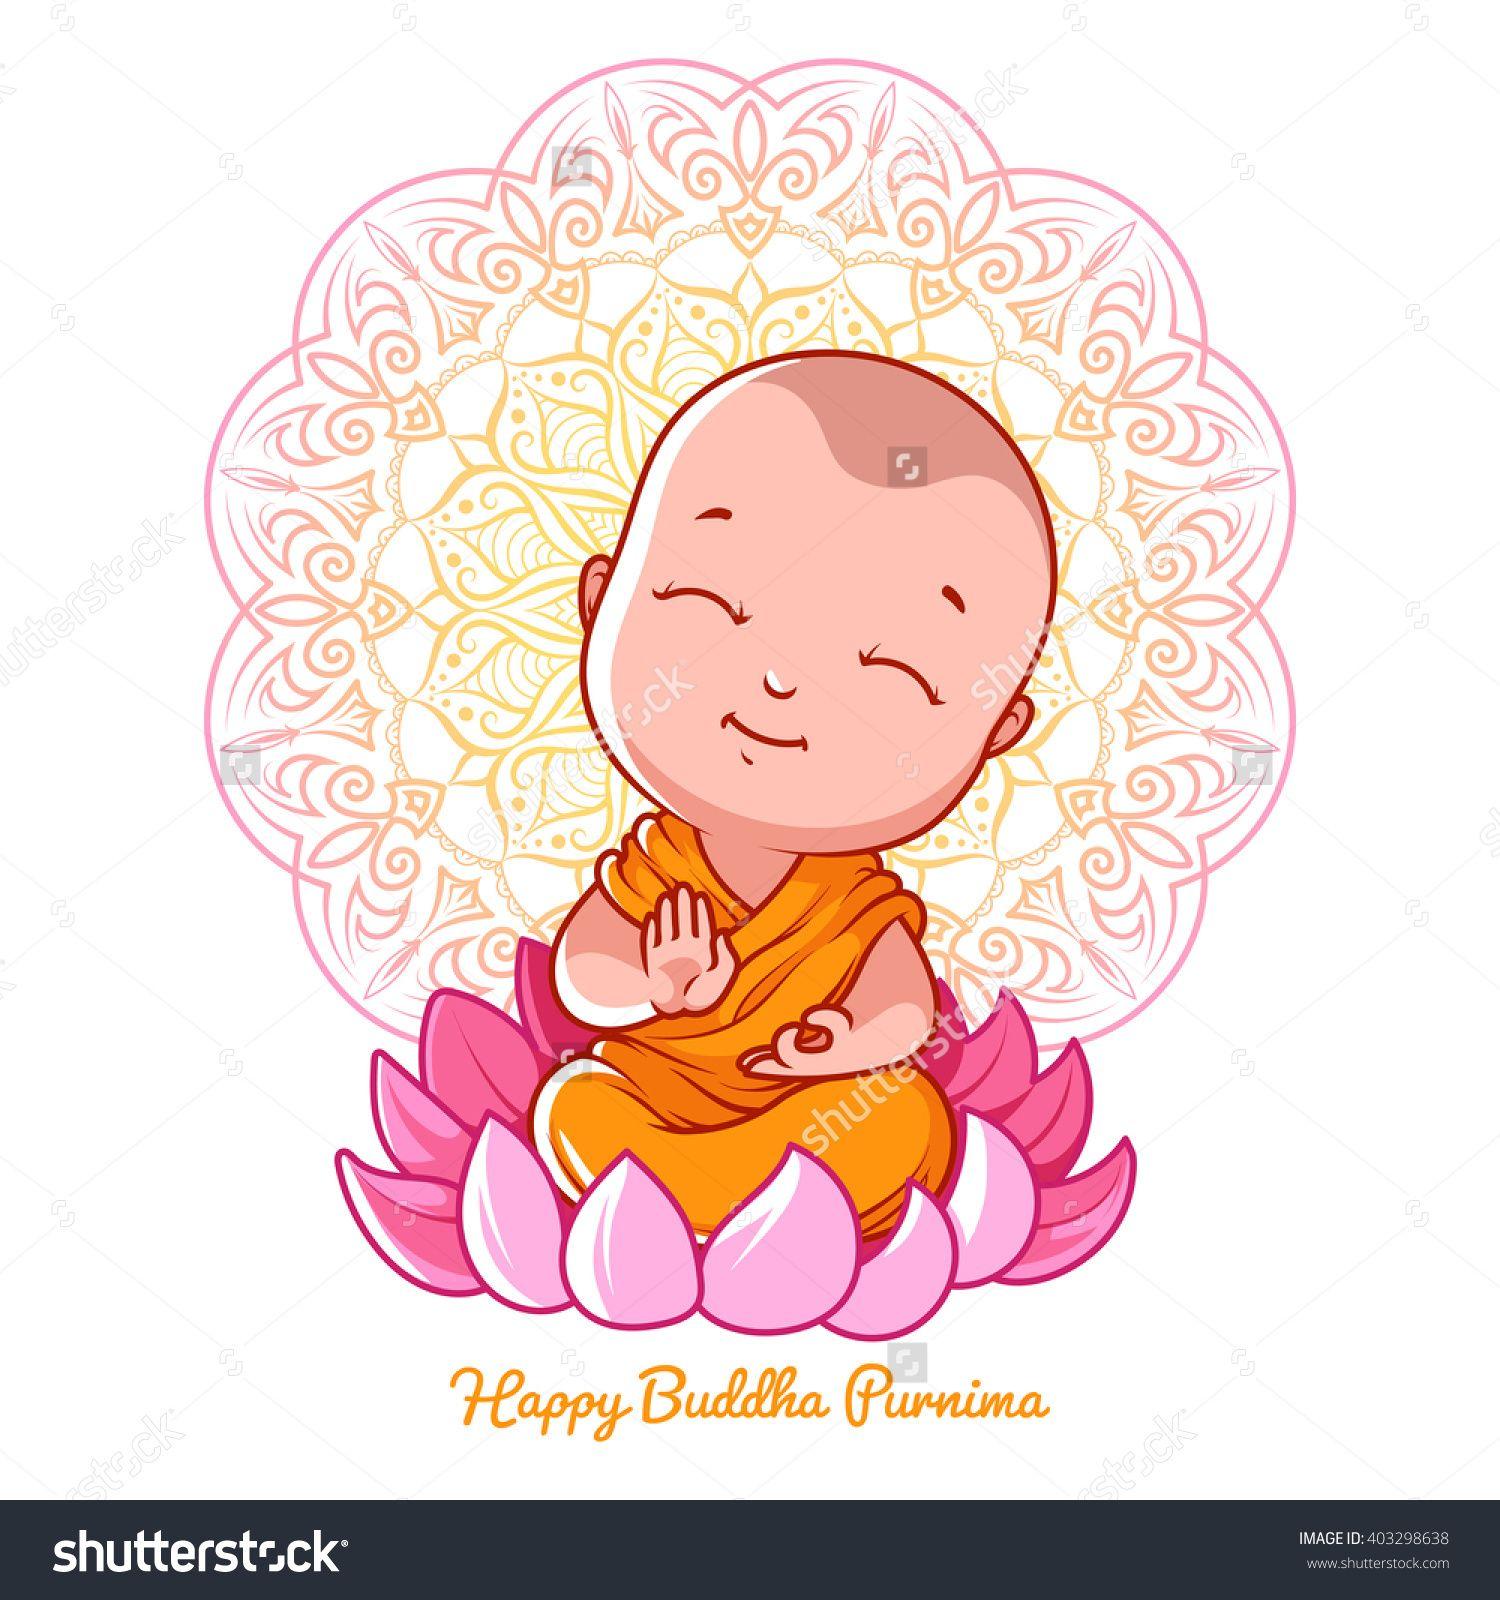 Image Result For Buddha Cartoon